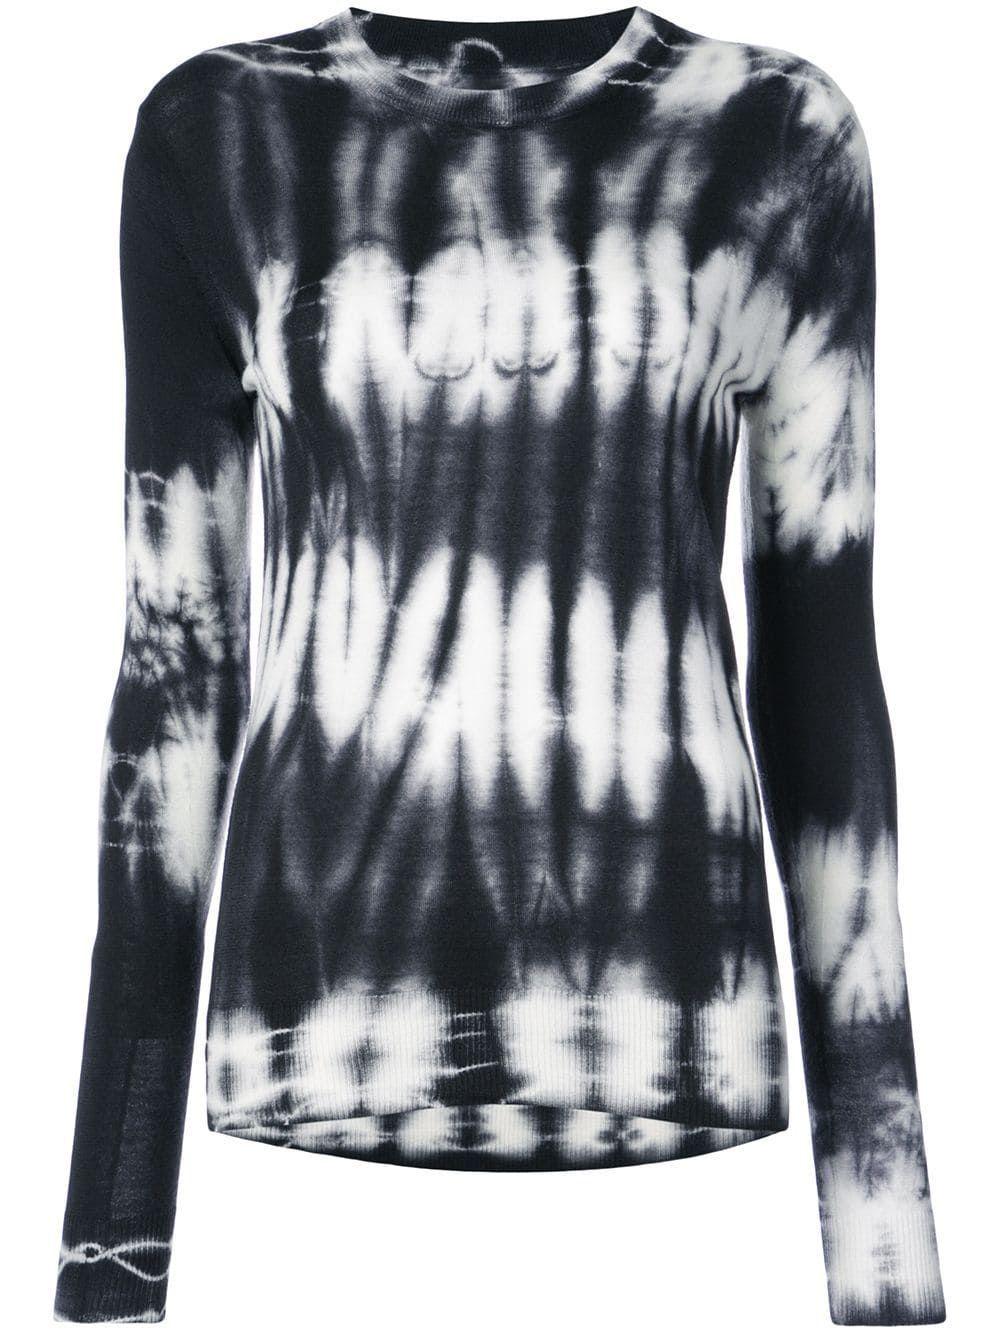 #PopbelaOOTD: Musim Panas Belum Lengkap Tanpa Tie-dye!